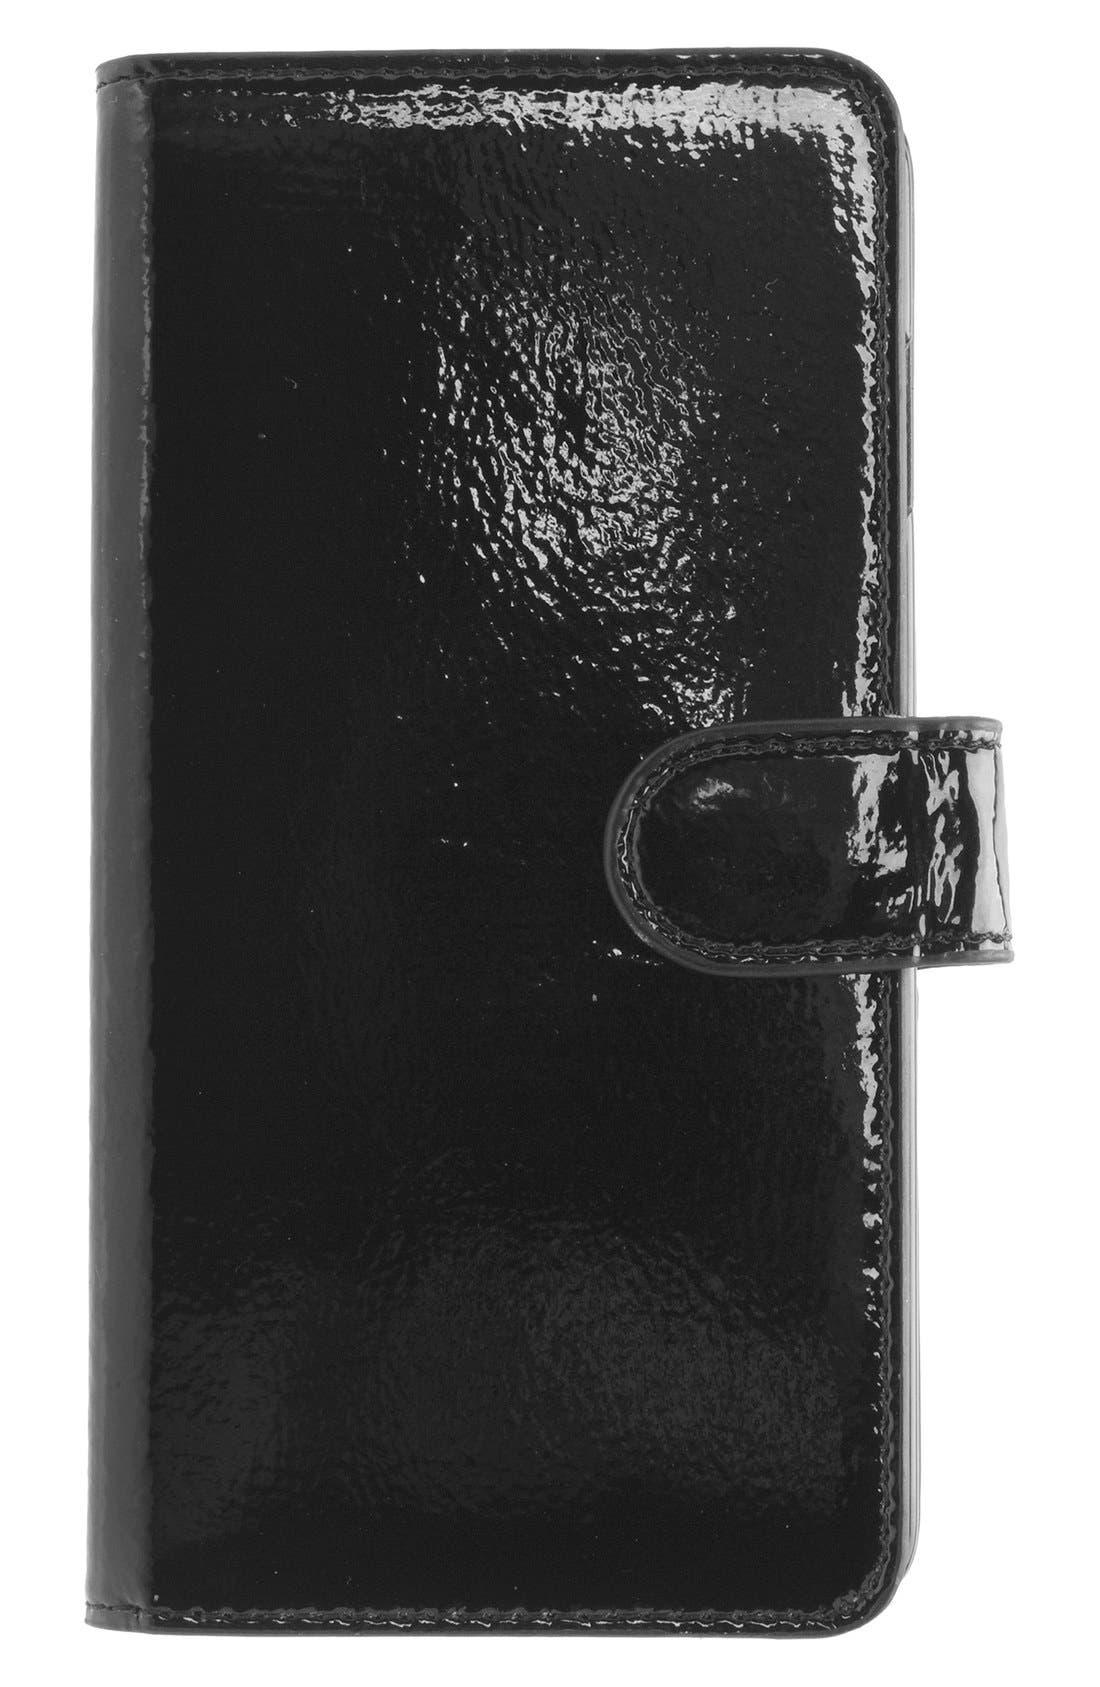 Main Image - Mobileluxe iPhone 6 Plus Wallet Case